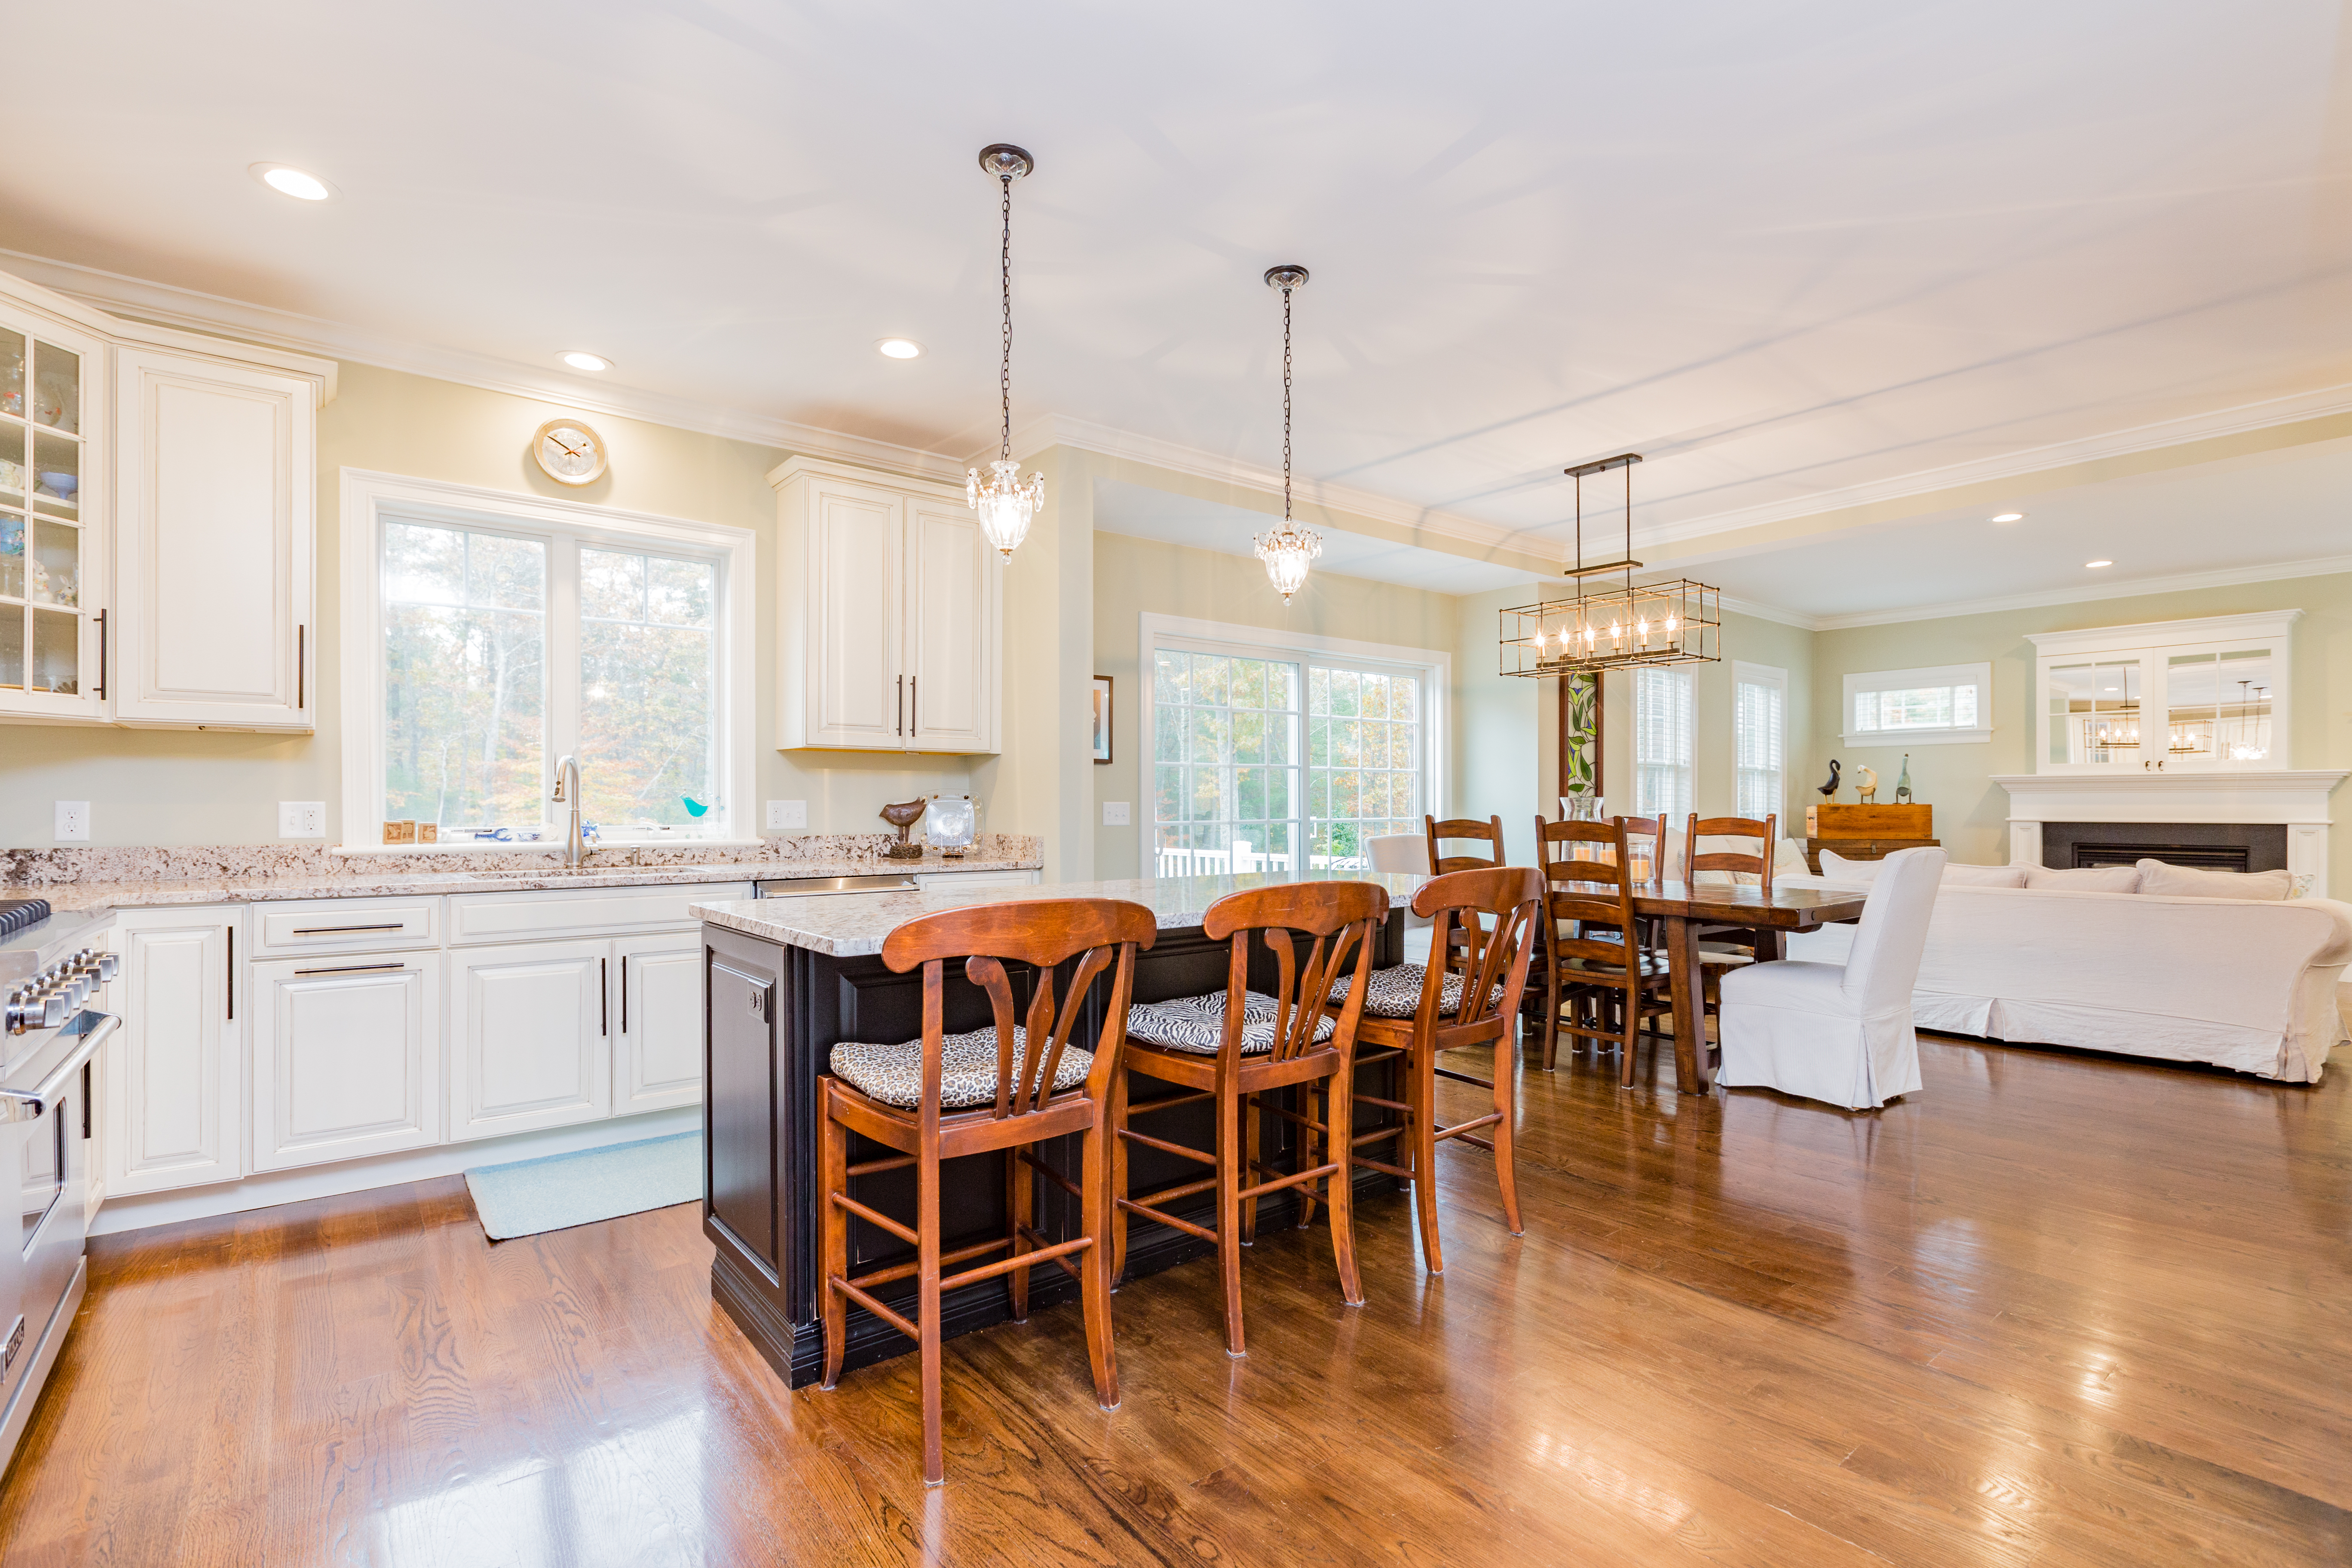 Norwell Wildcat Hill Neighborhood Homes For Sale